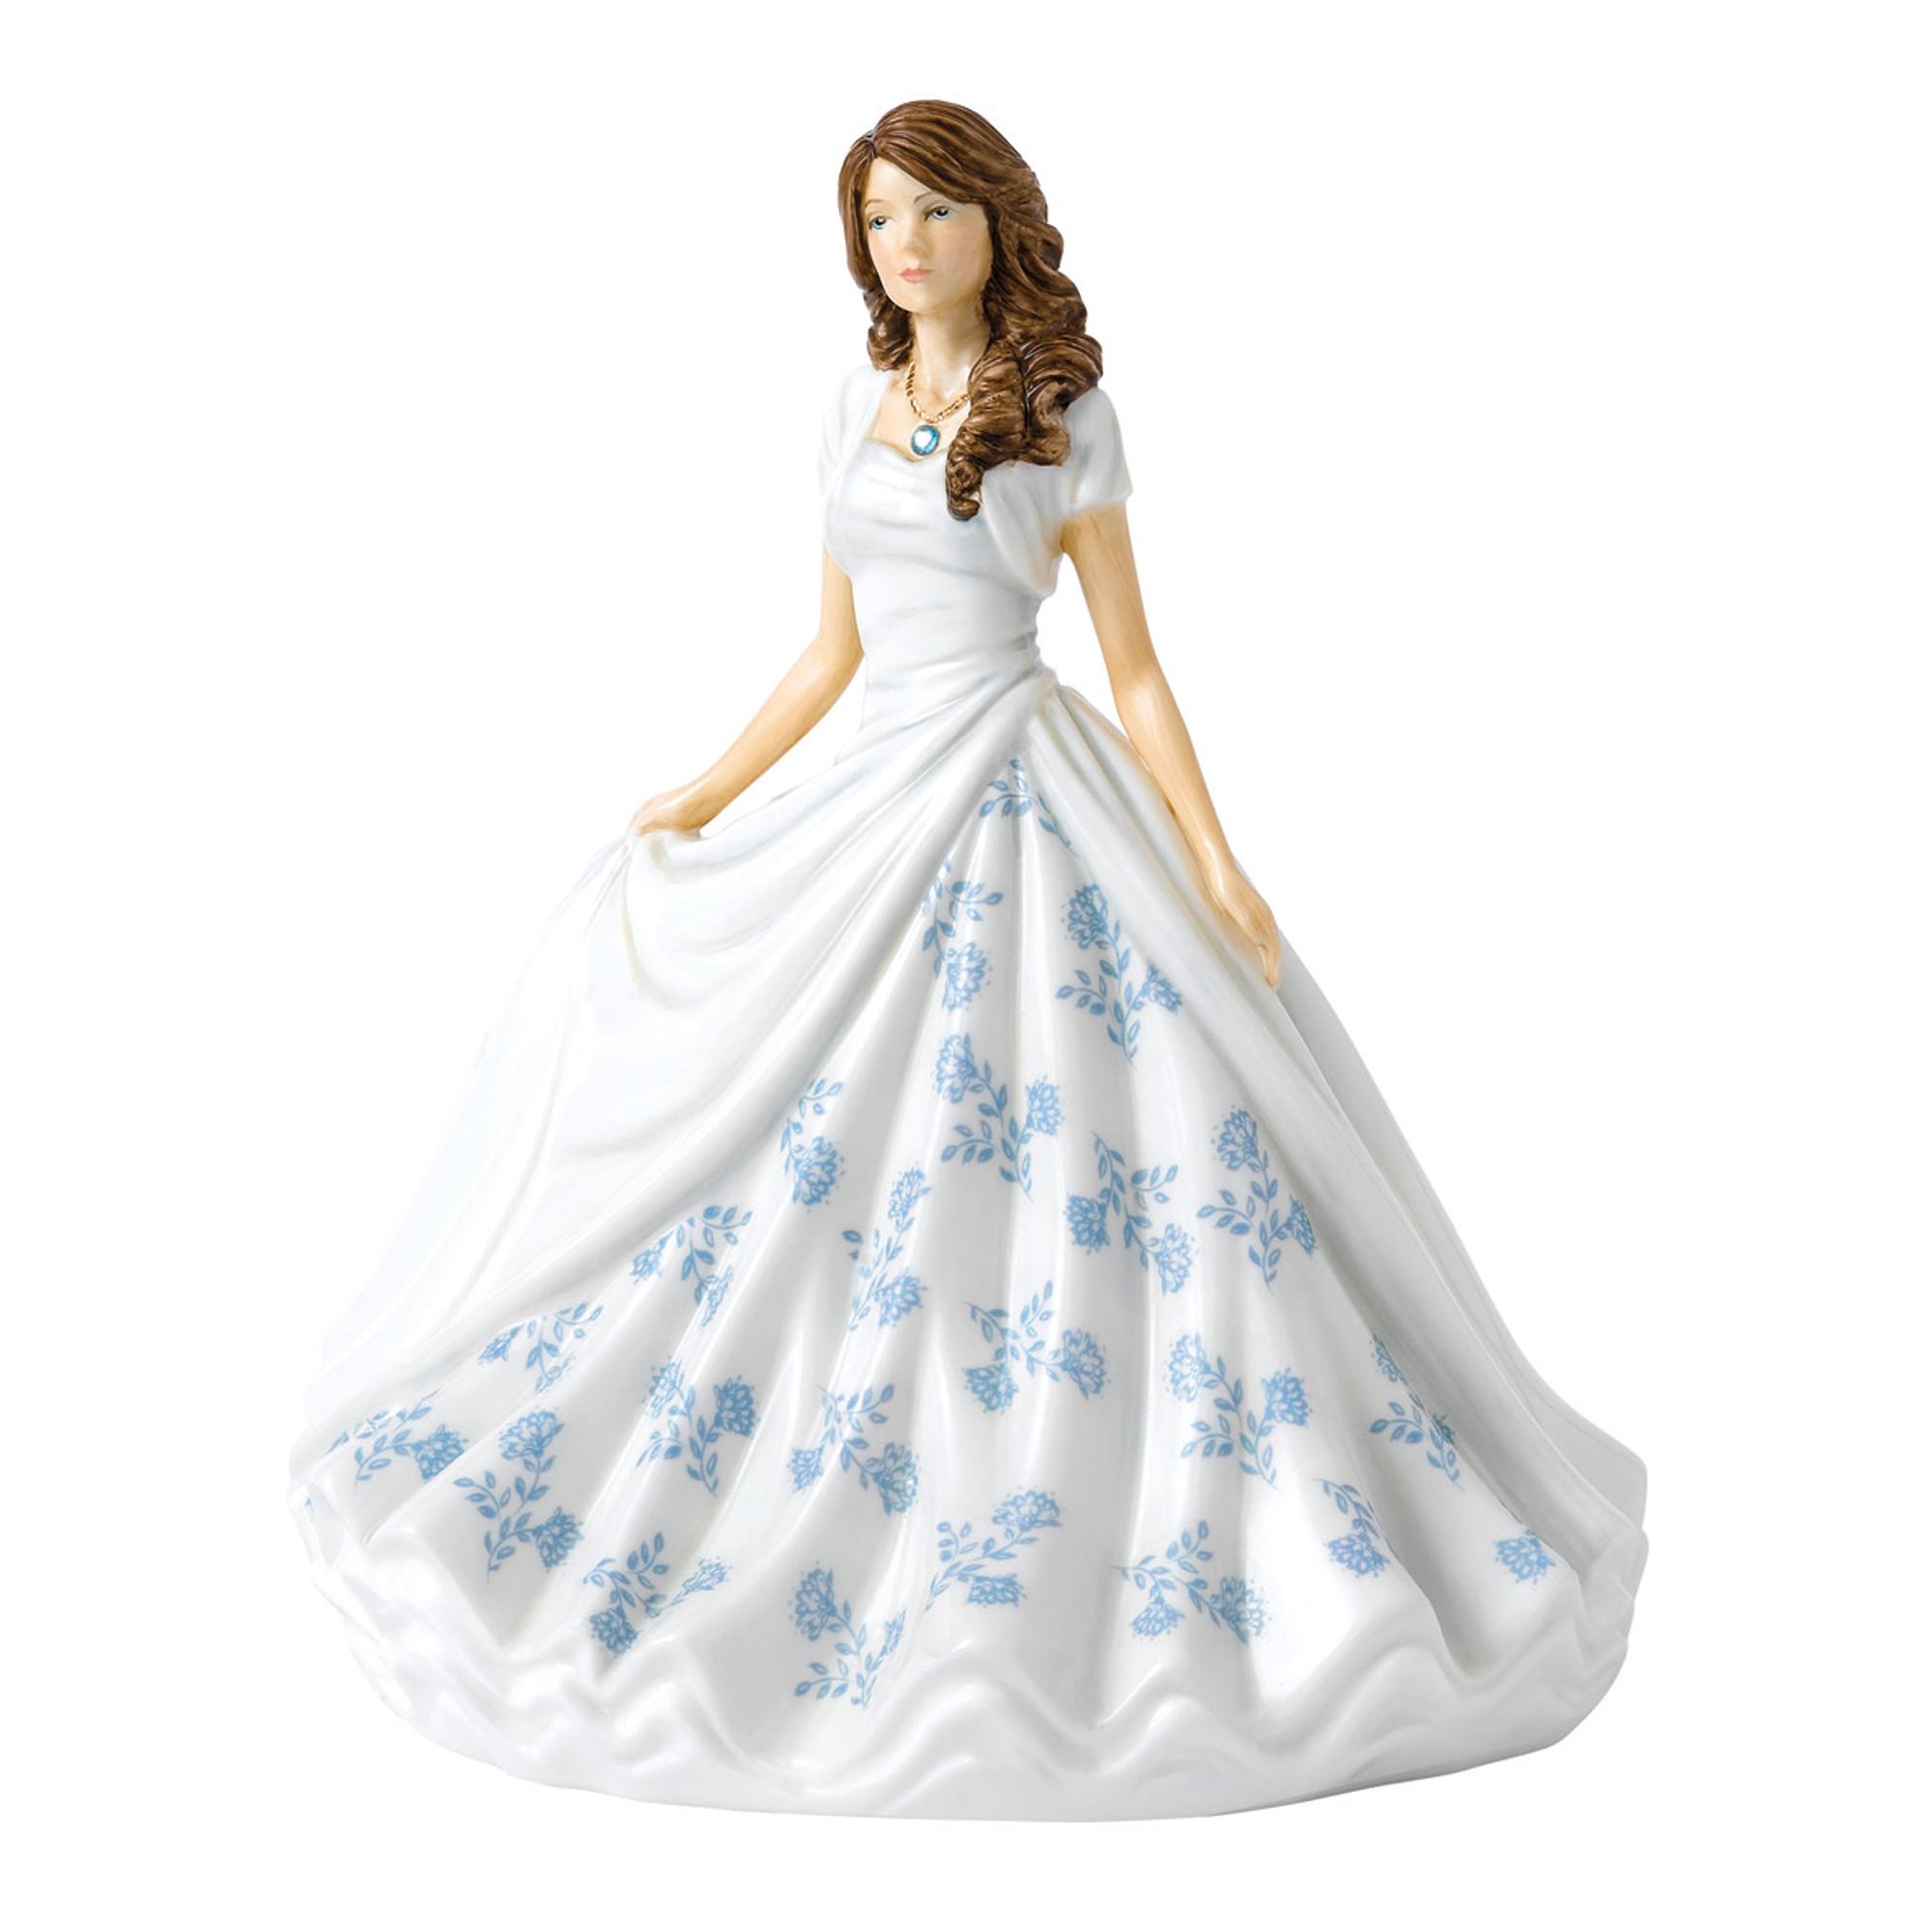 March (Aquamarine) HN5899 Royal Doulton Figurine